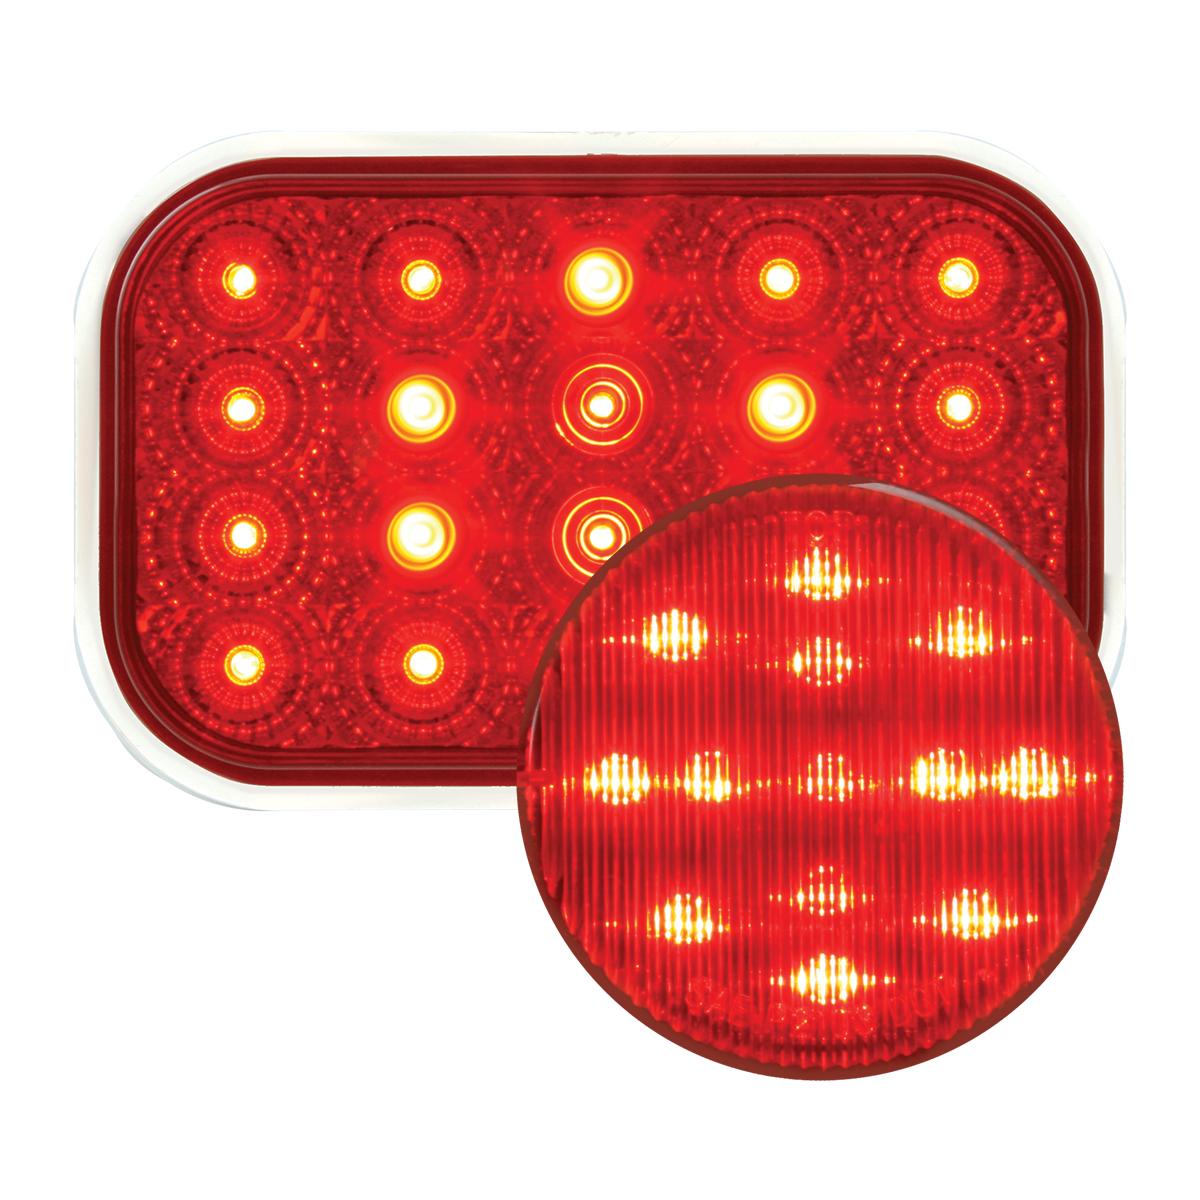 #77013/#76662 Spyder LED Red/Red - Flat